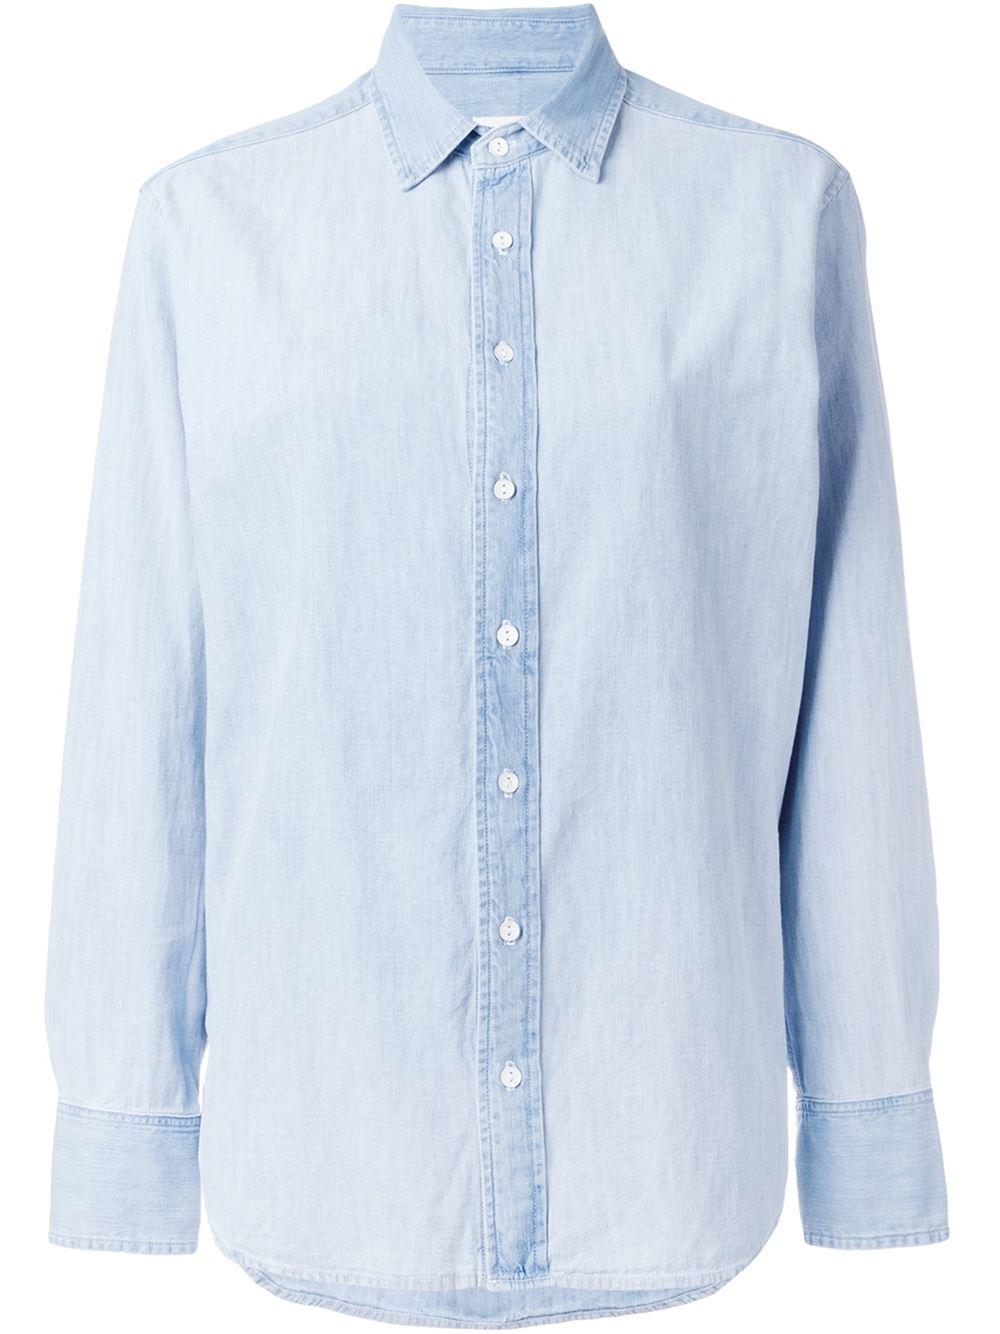 Rag bone denim shirt in blue lyst for Rag bone shirt